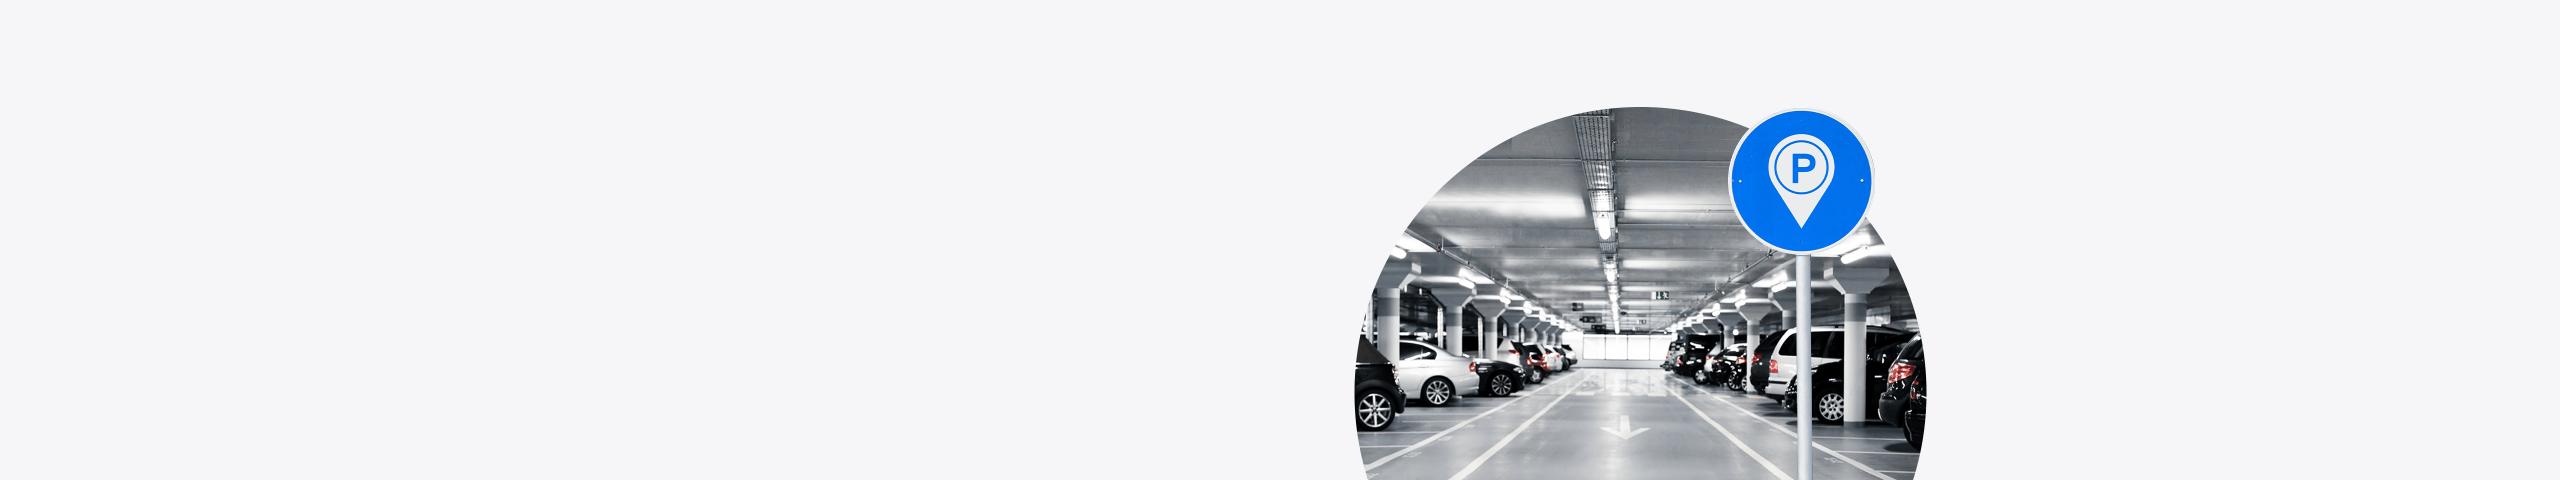 Ипотека на приобретение гаража или машино-места